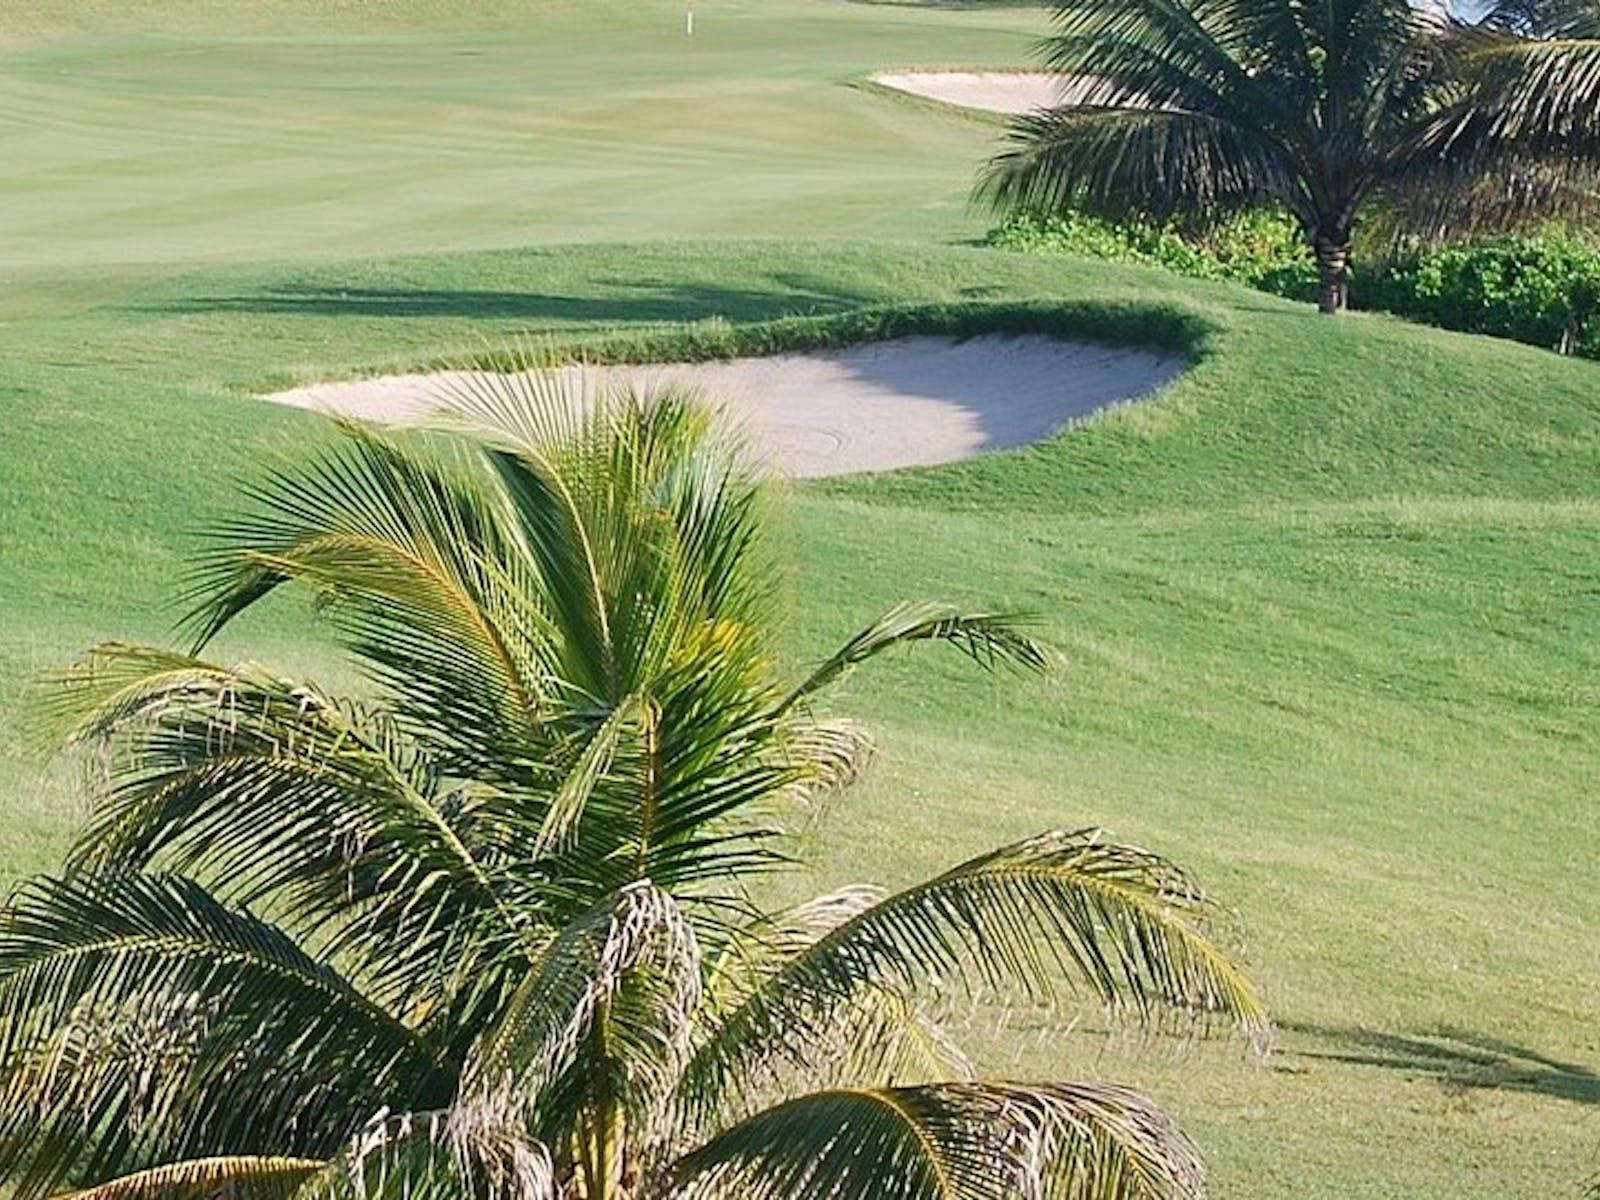 Jamaica golf course in Hawaii